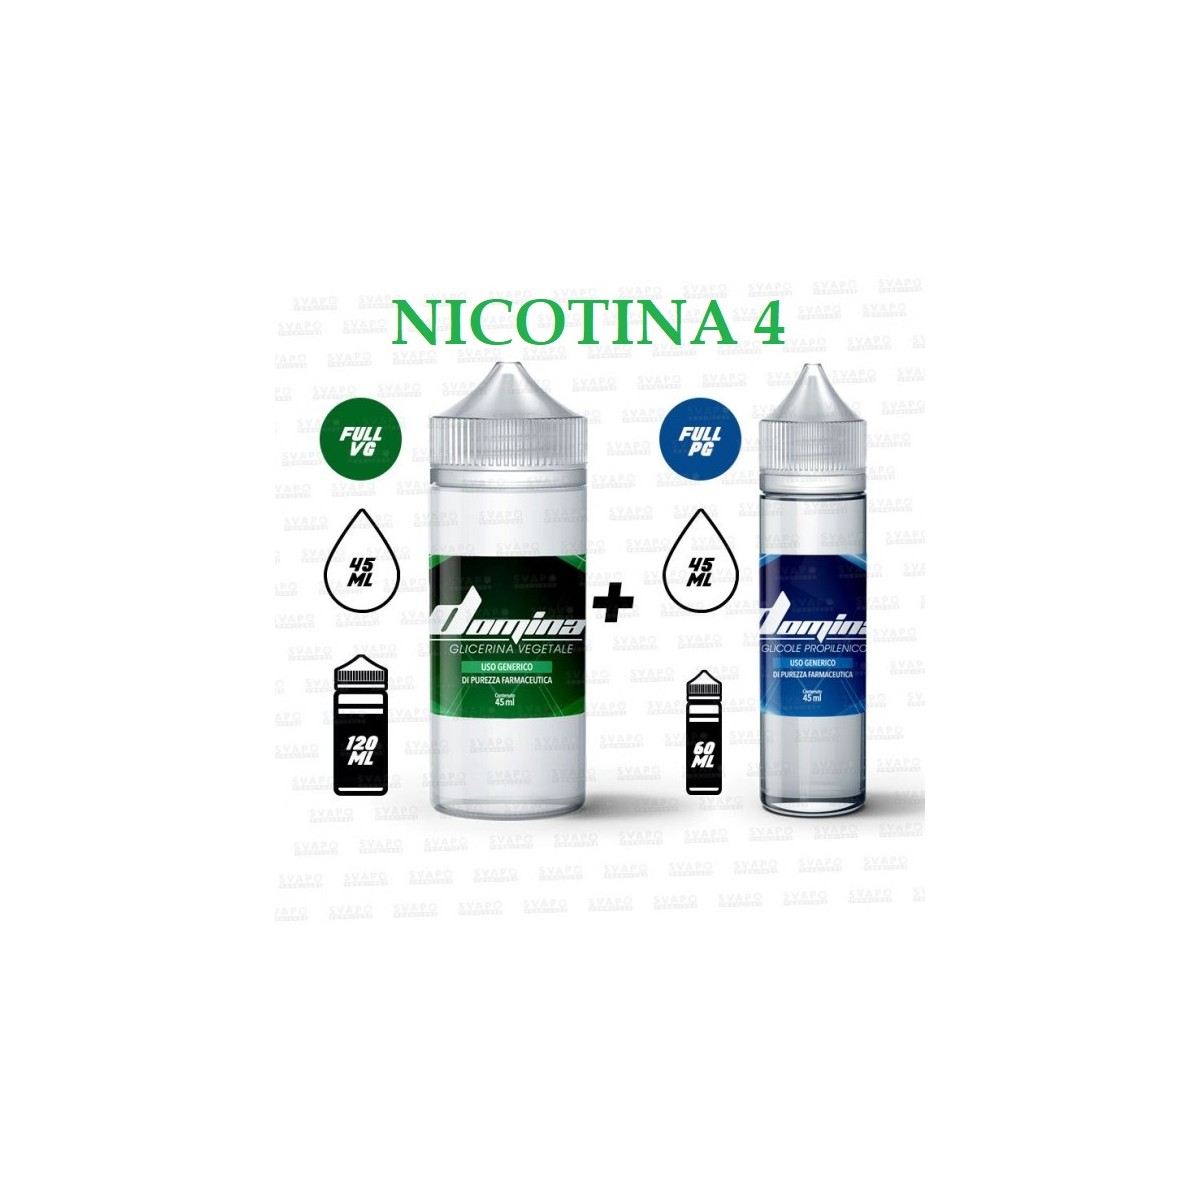 Bundle - Domina 100 Series 50/50 - 4mg/ml Nic